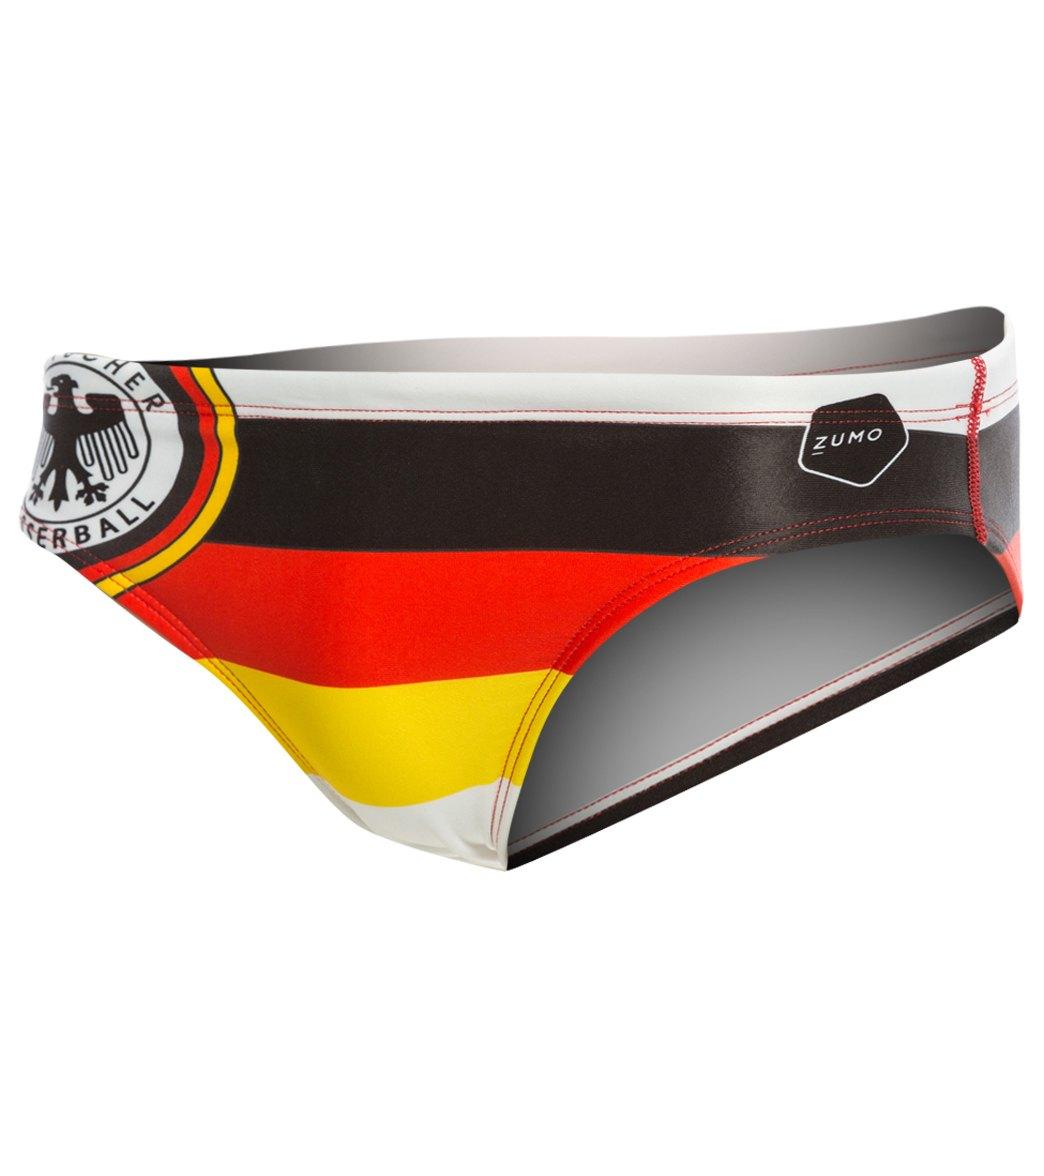 f9875fc665 Zumo Germany Water Polo Brief at SwimOutlet.com